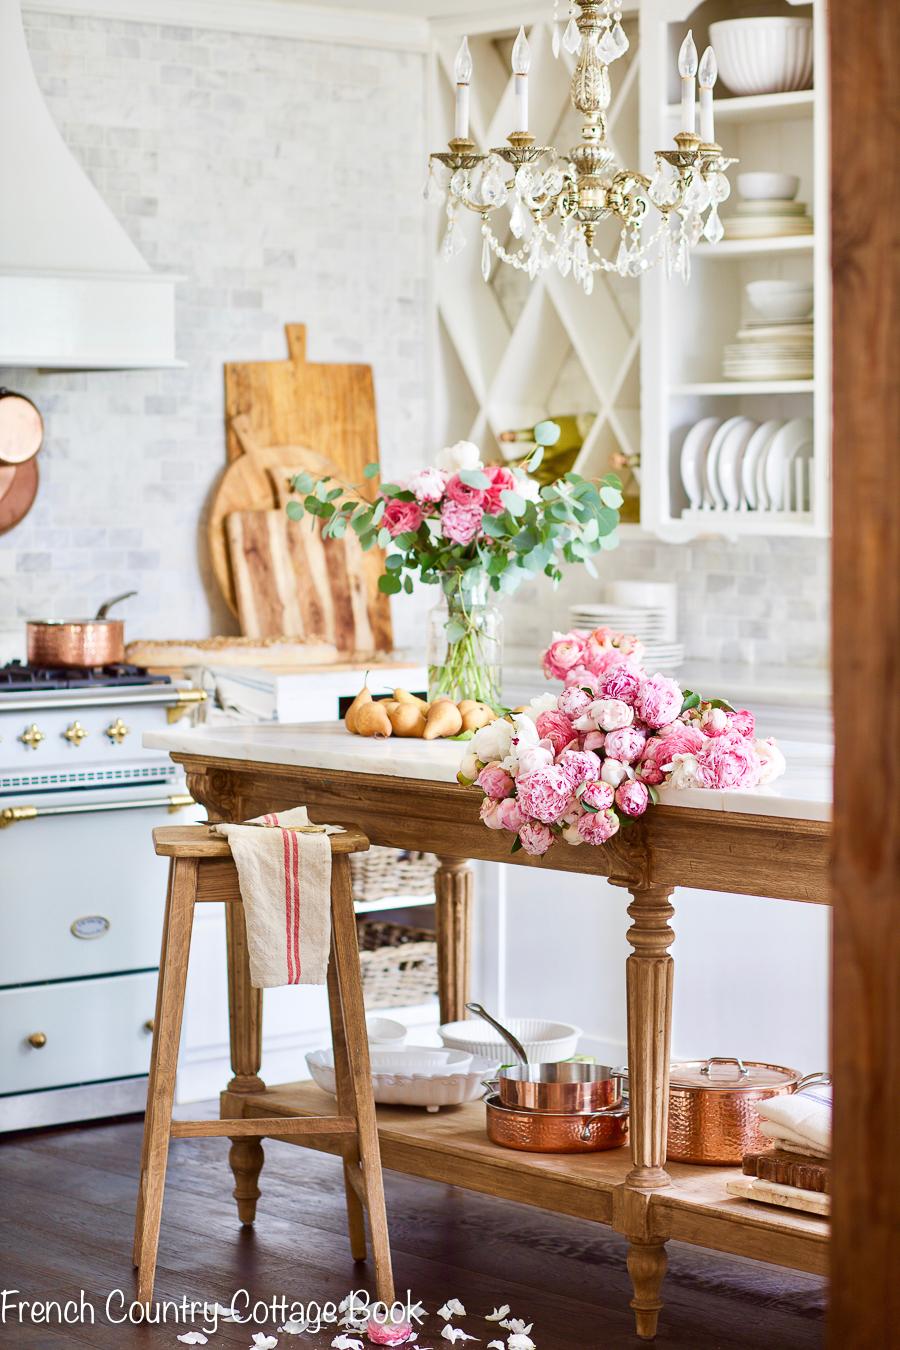 4 Ways To Add French Farmhouse Charm Your Kitchen